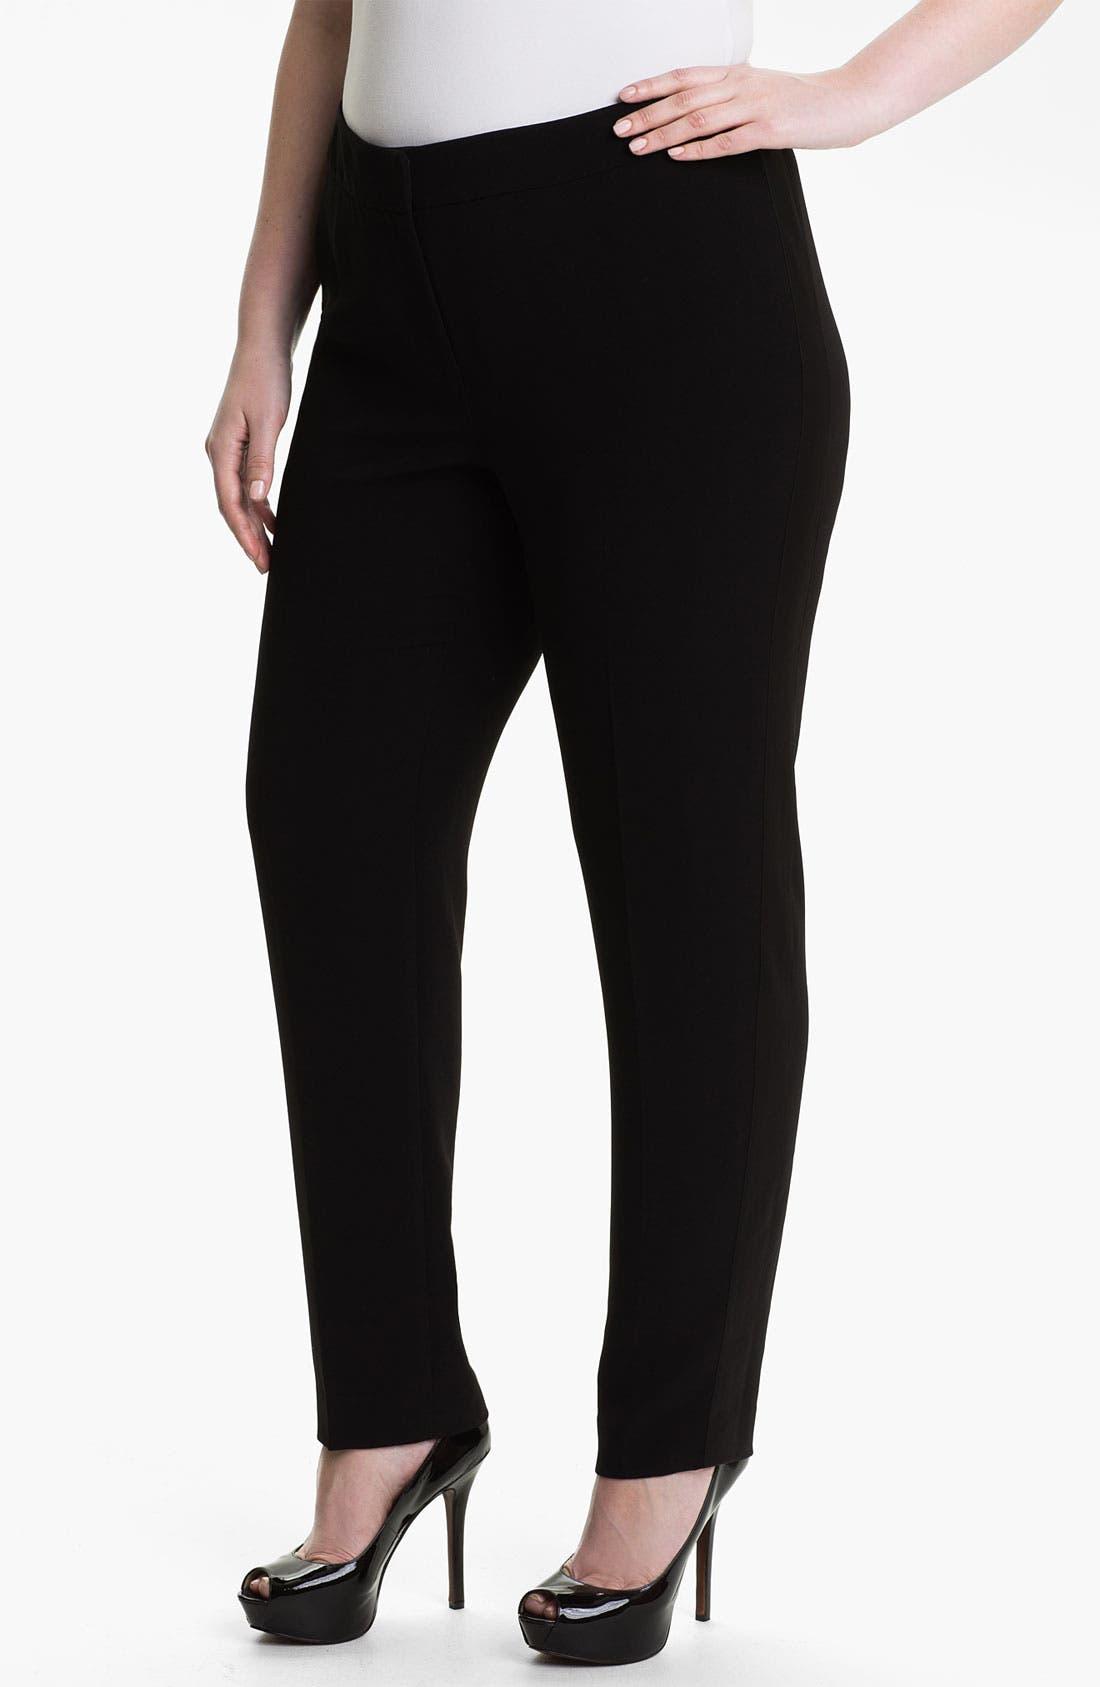 Alternate Image 1 Selected - Sejour 'Ava' Tuxedo Pants (Plus)